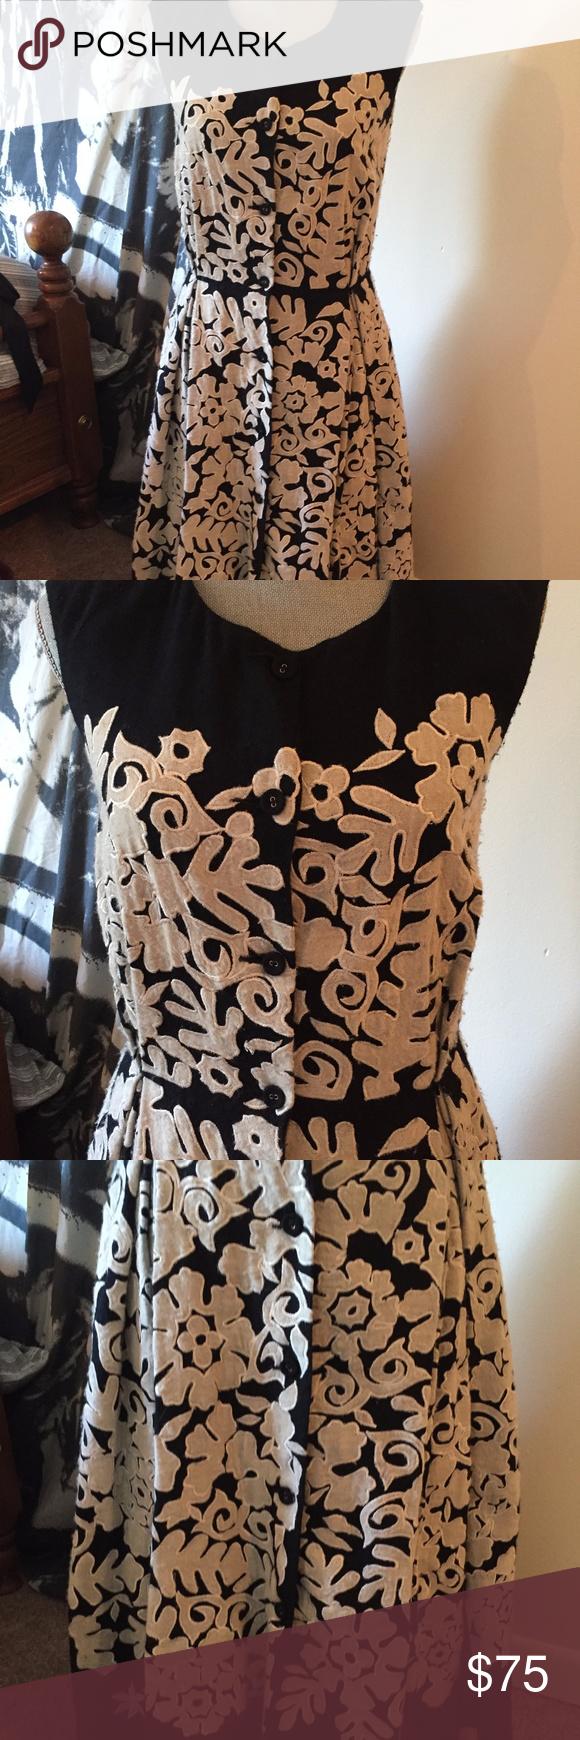 4f731dae103d Nicole Farhi Sleeveless Wool Embroidered Dress Beautiful 100% wool and 100%  silk lining dress